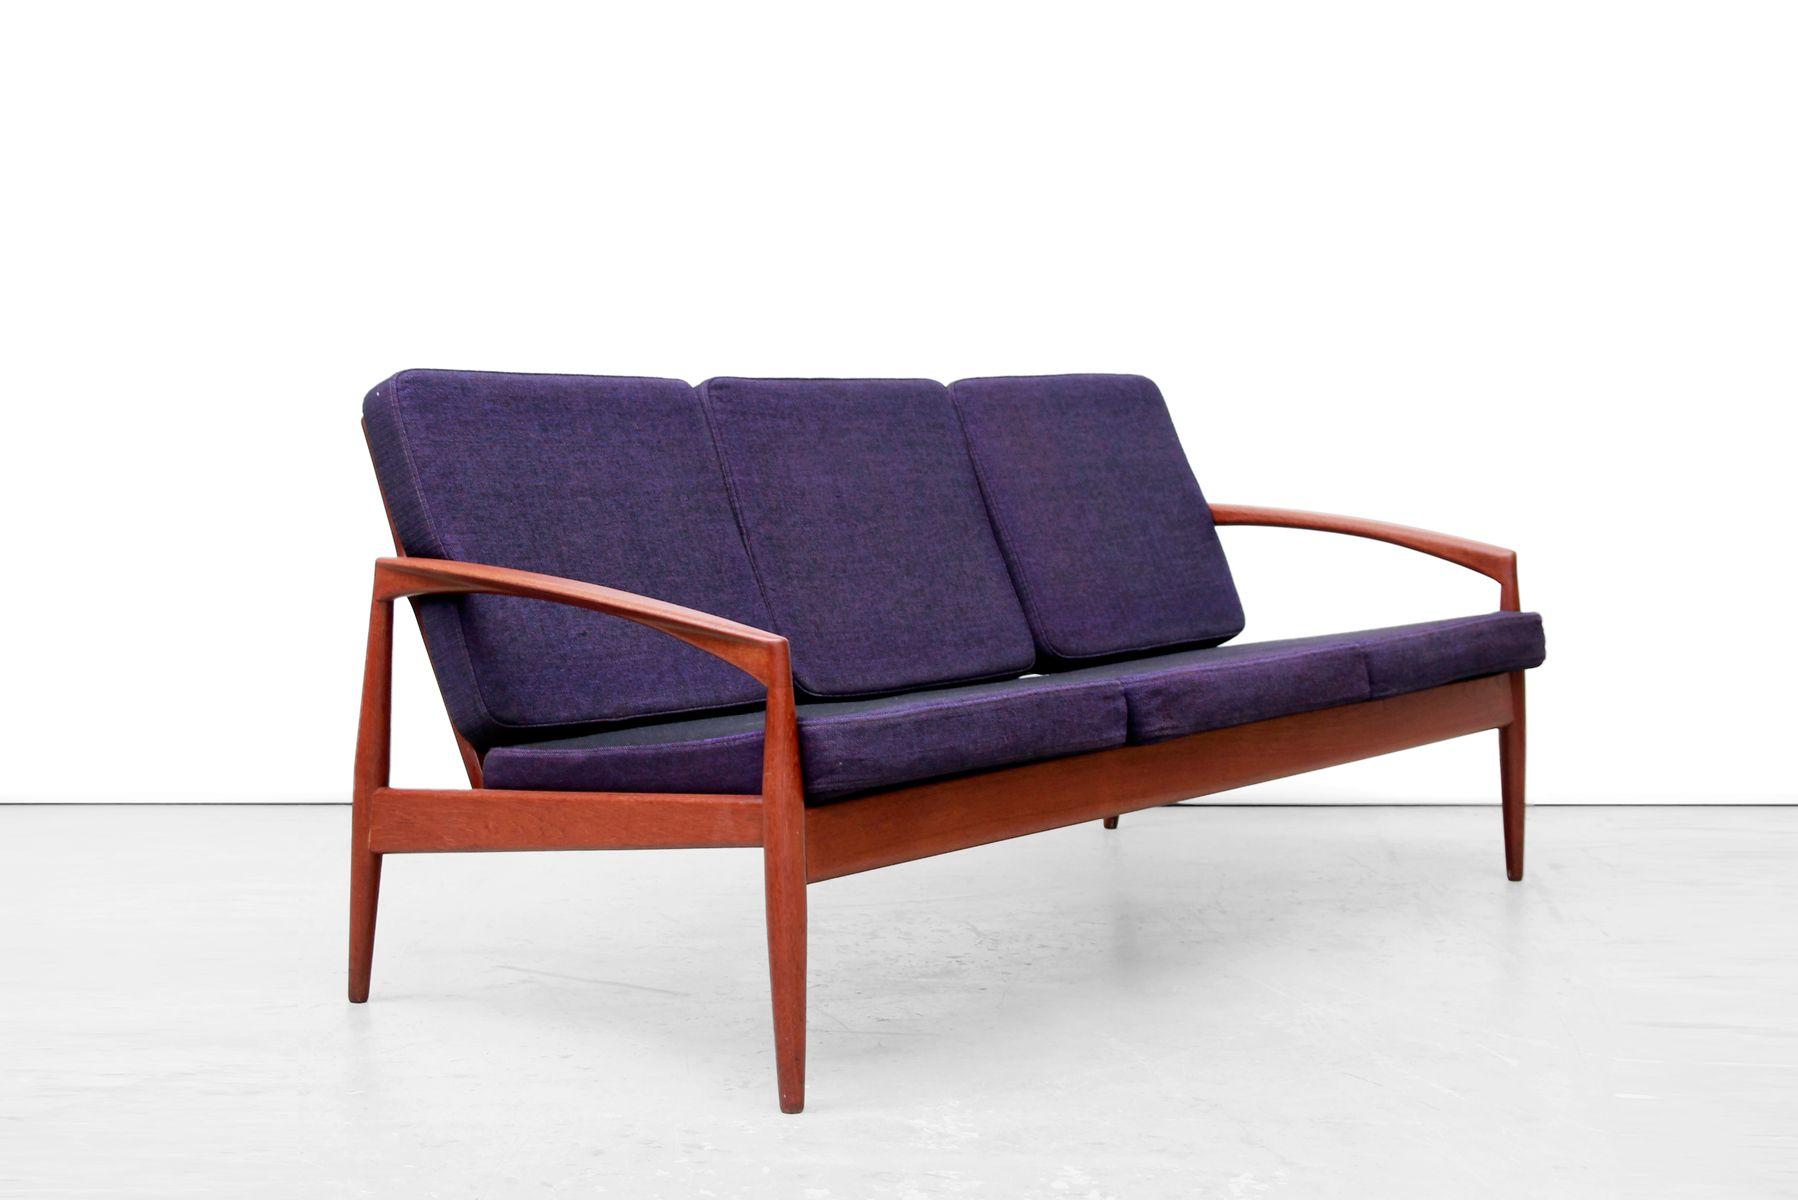 d nisches modell 121 paperknife teak sofa von kai. Black Bedroom Furniture Sets. Home Design Ideas